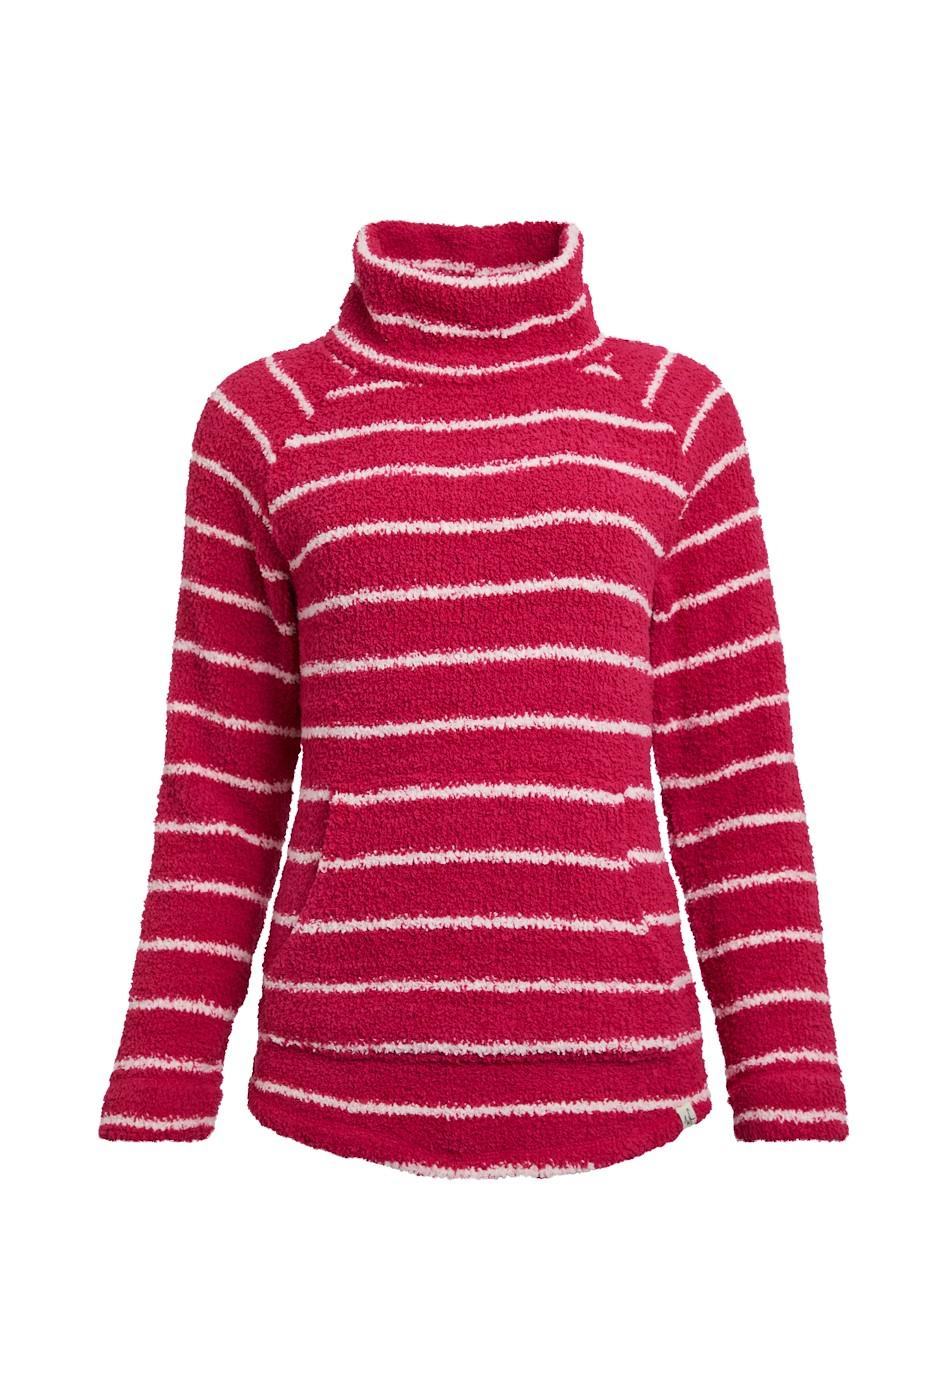 Sarno Stripe Polyester Feather Fleece Cranberry